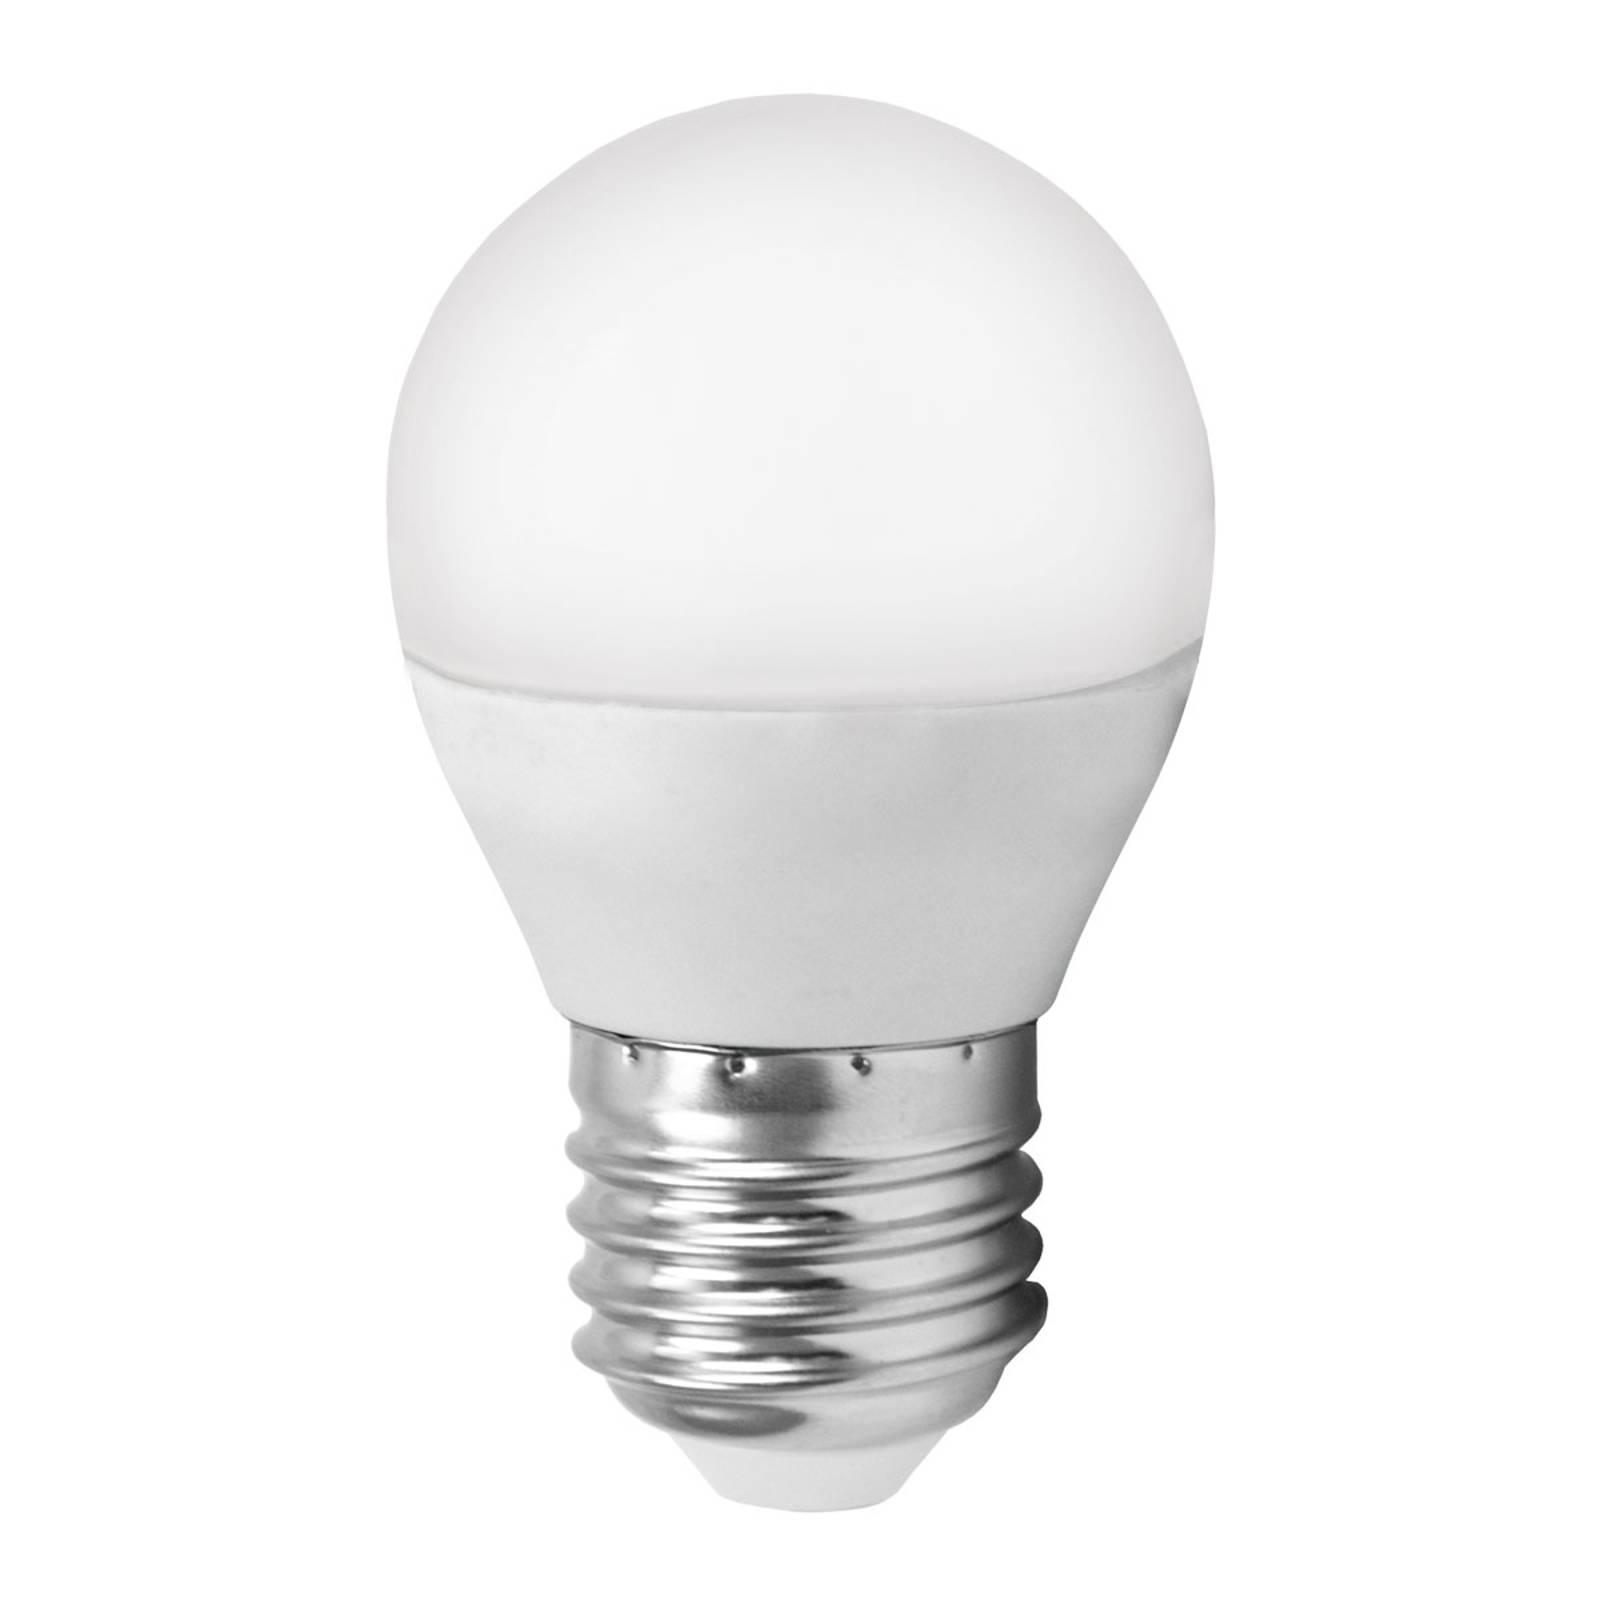 LED-lamppu E27 G45 4W MiniGlobe, lämmin valkoinen